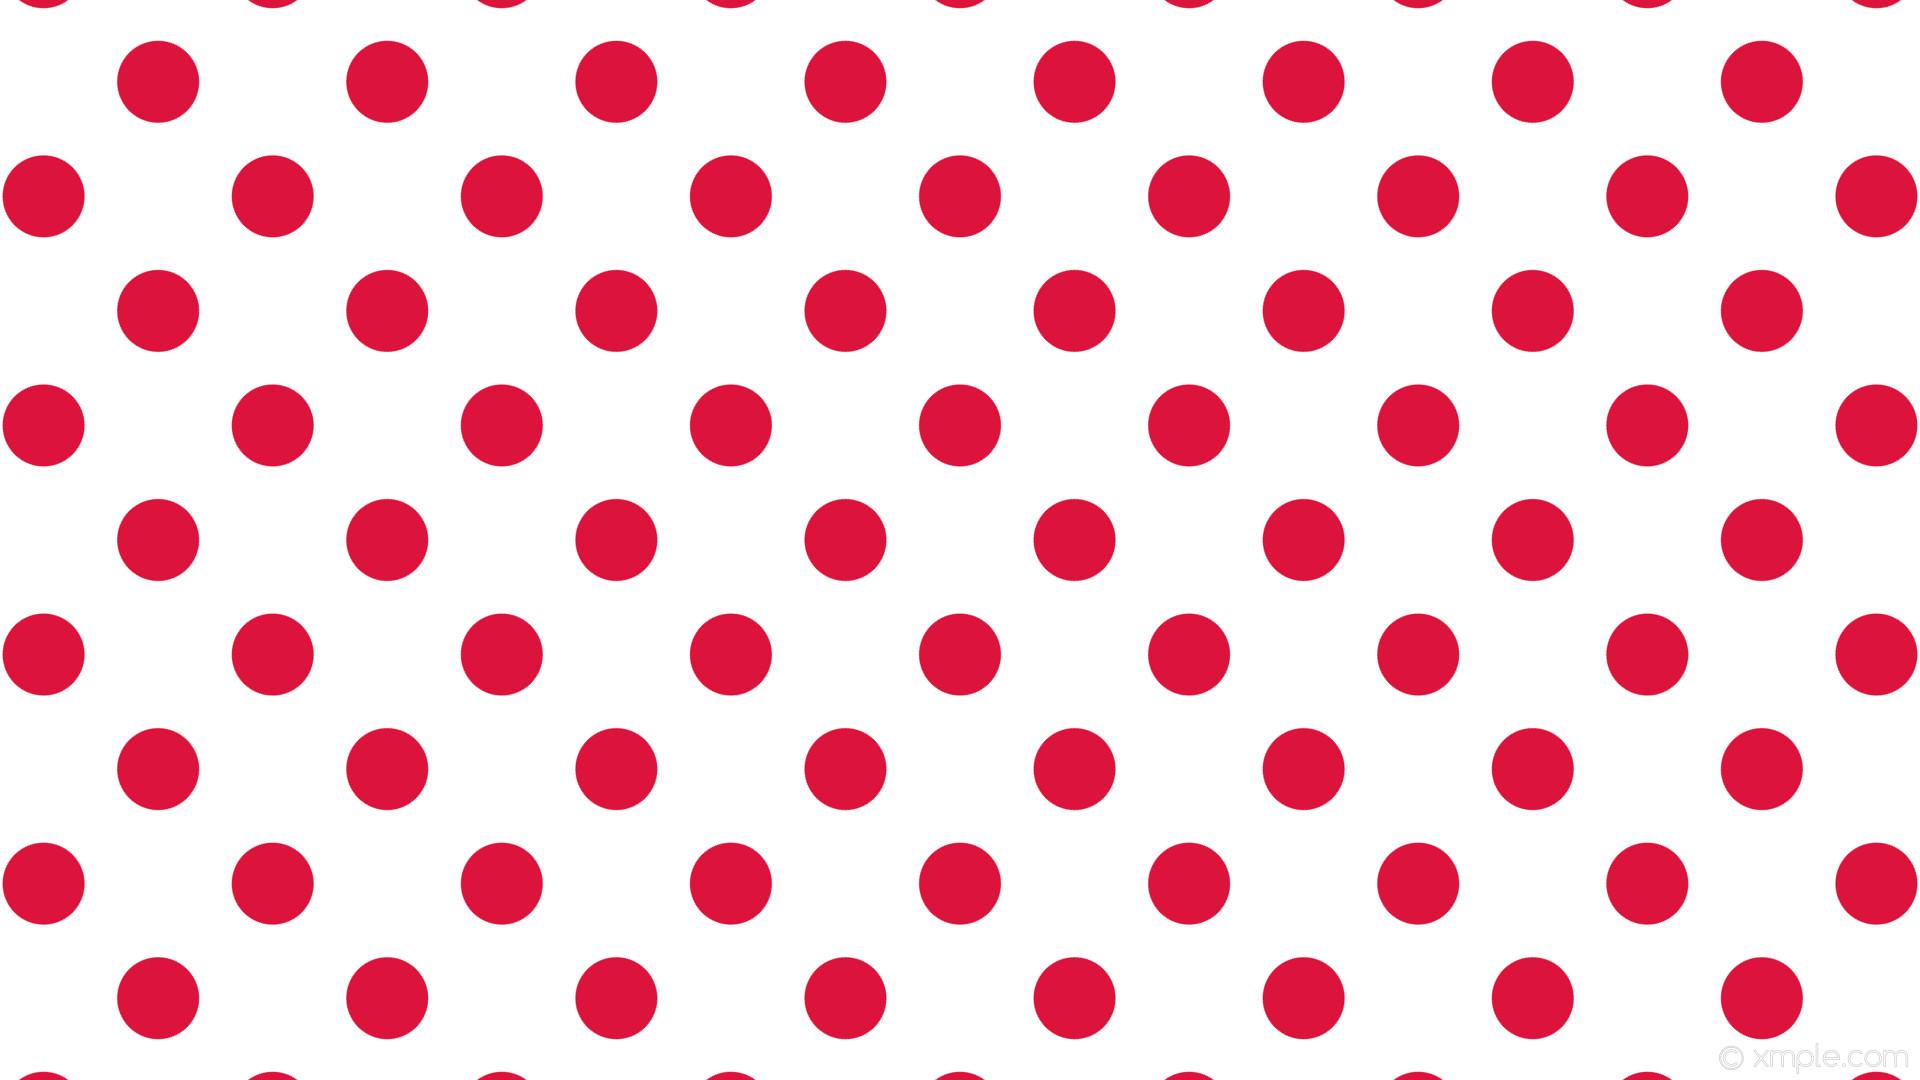 wallpaper white polka red spots dots crimson #ffffff #dc143c 315° 82px 162px